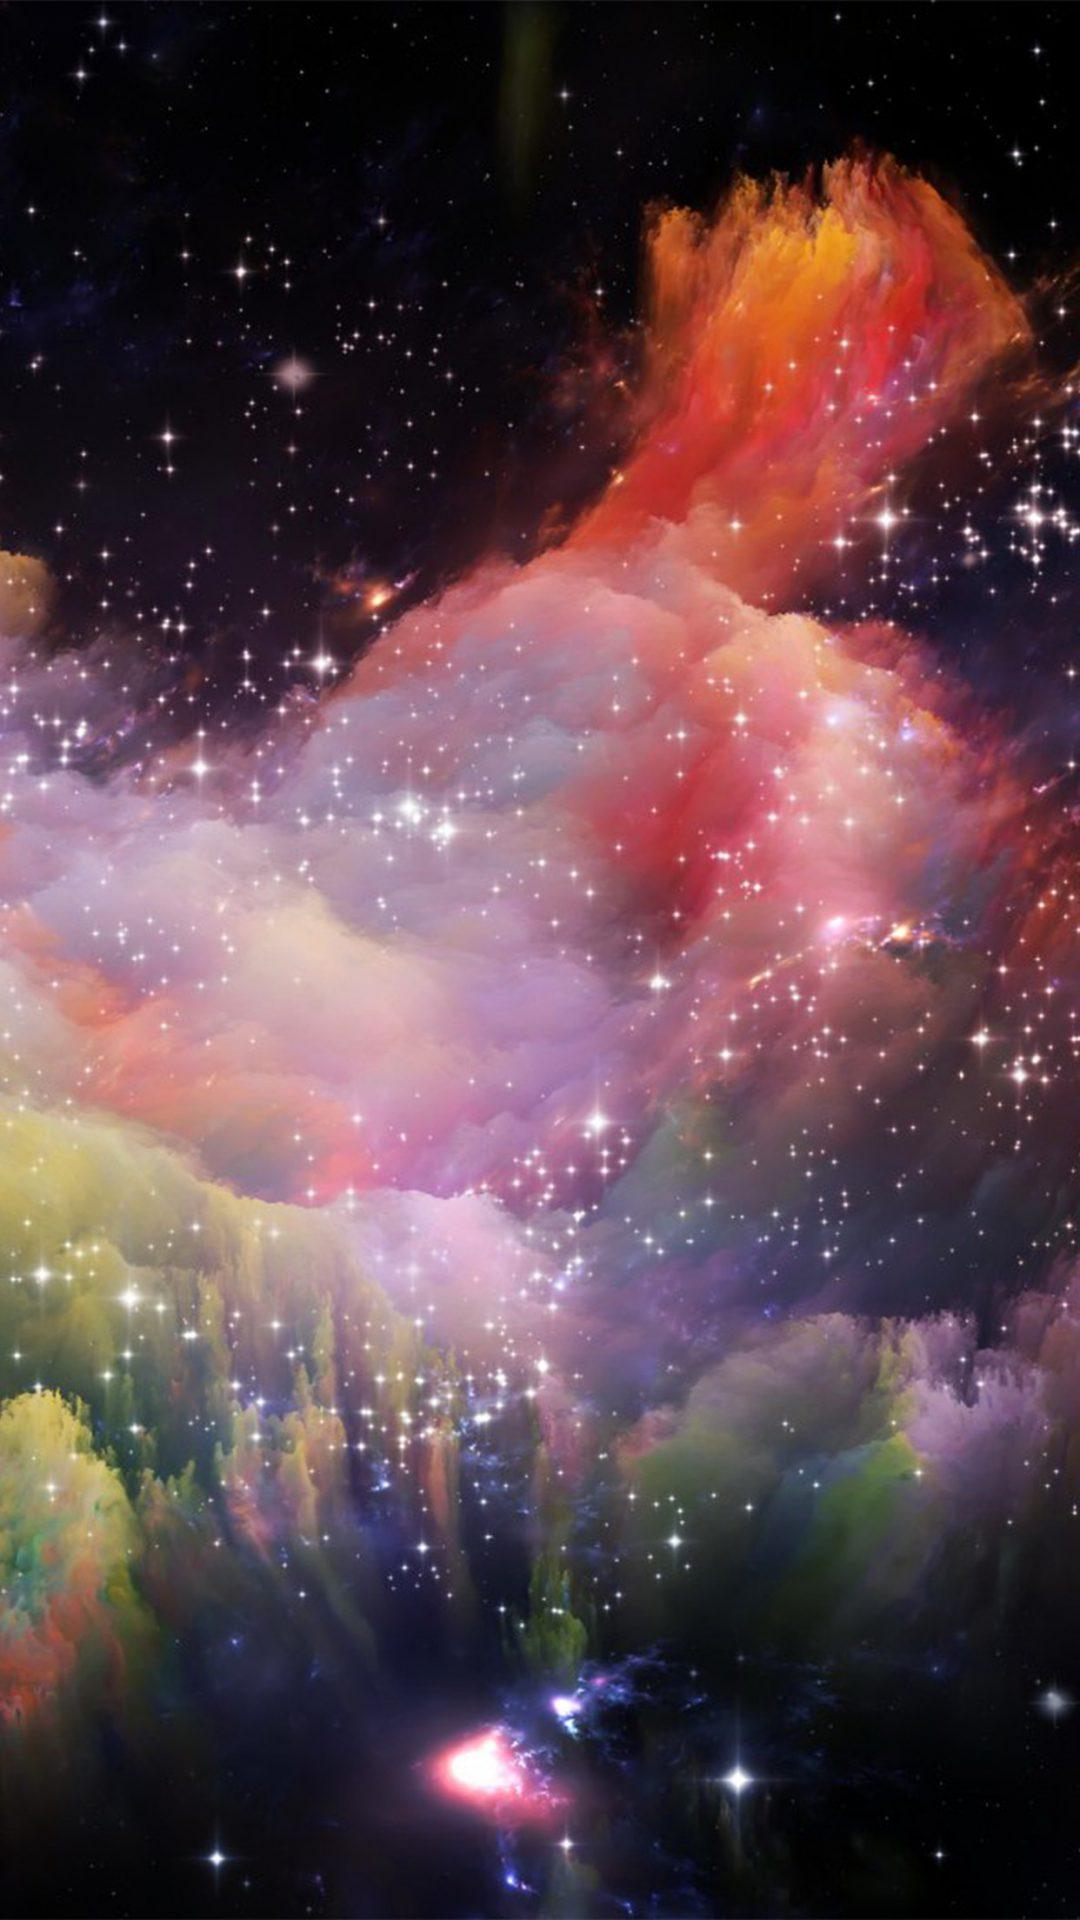 Space Rainbow Colorful Star Art Illustration